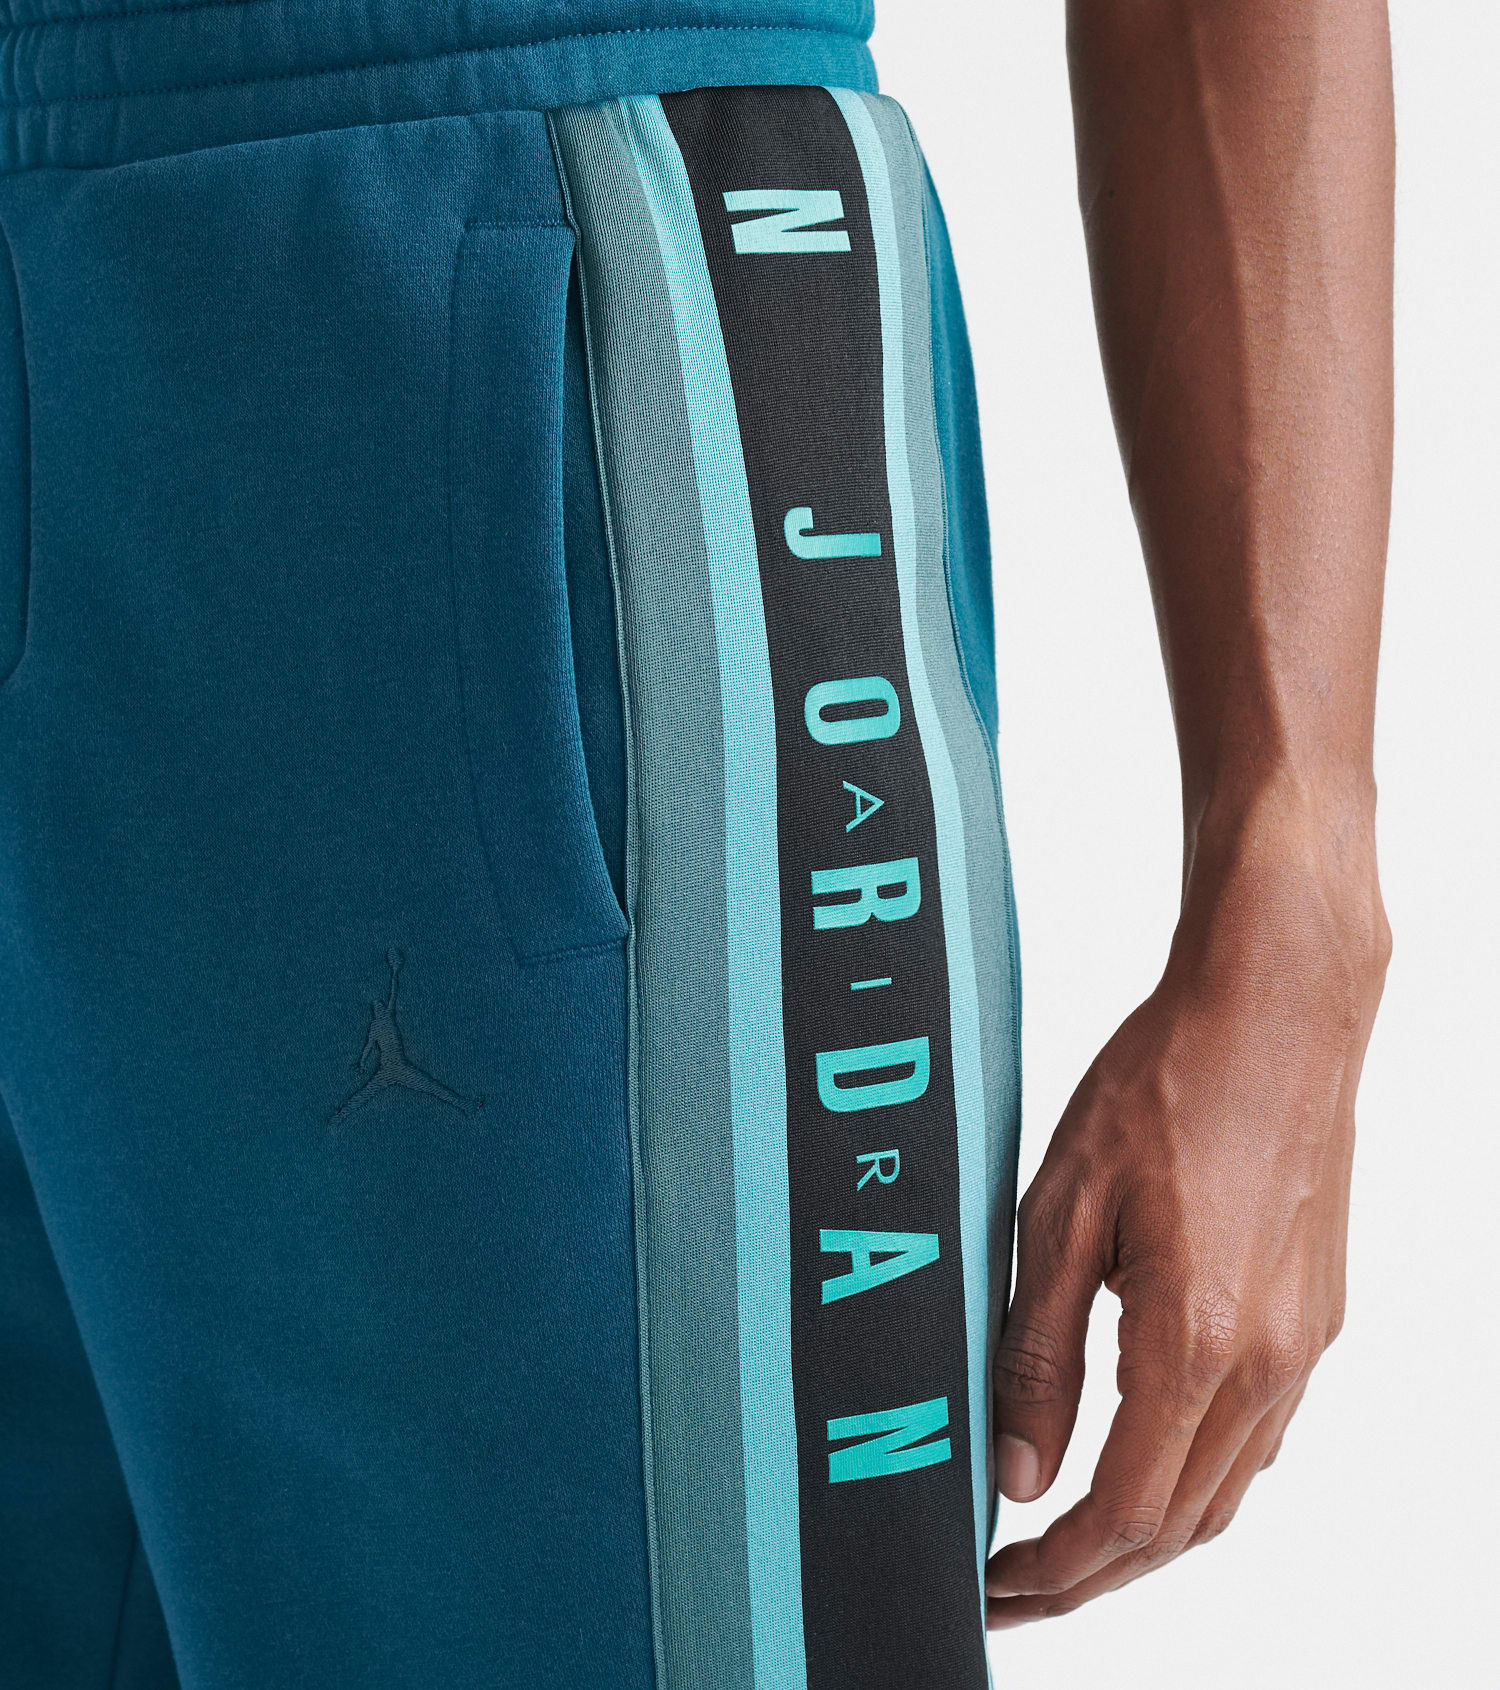 air-jordan-5-oil-grey-matching-pants